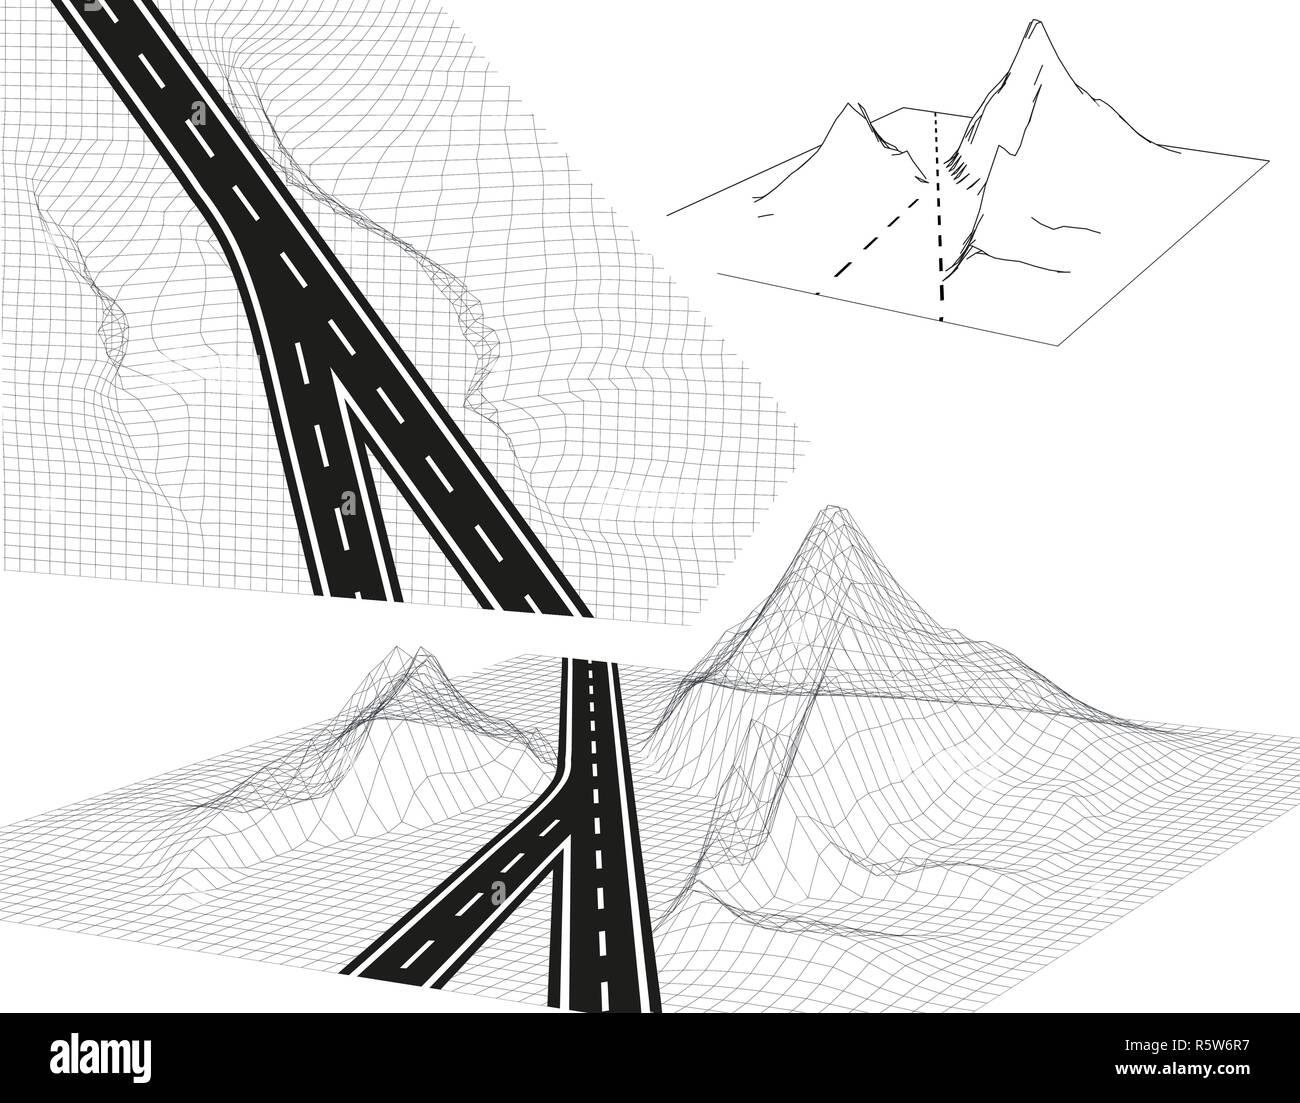 Road, highway in 3D. View from above and in Perspective. Highway design. Skeletal Framed Landscape. illustration Stock Vector